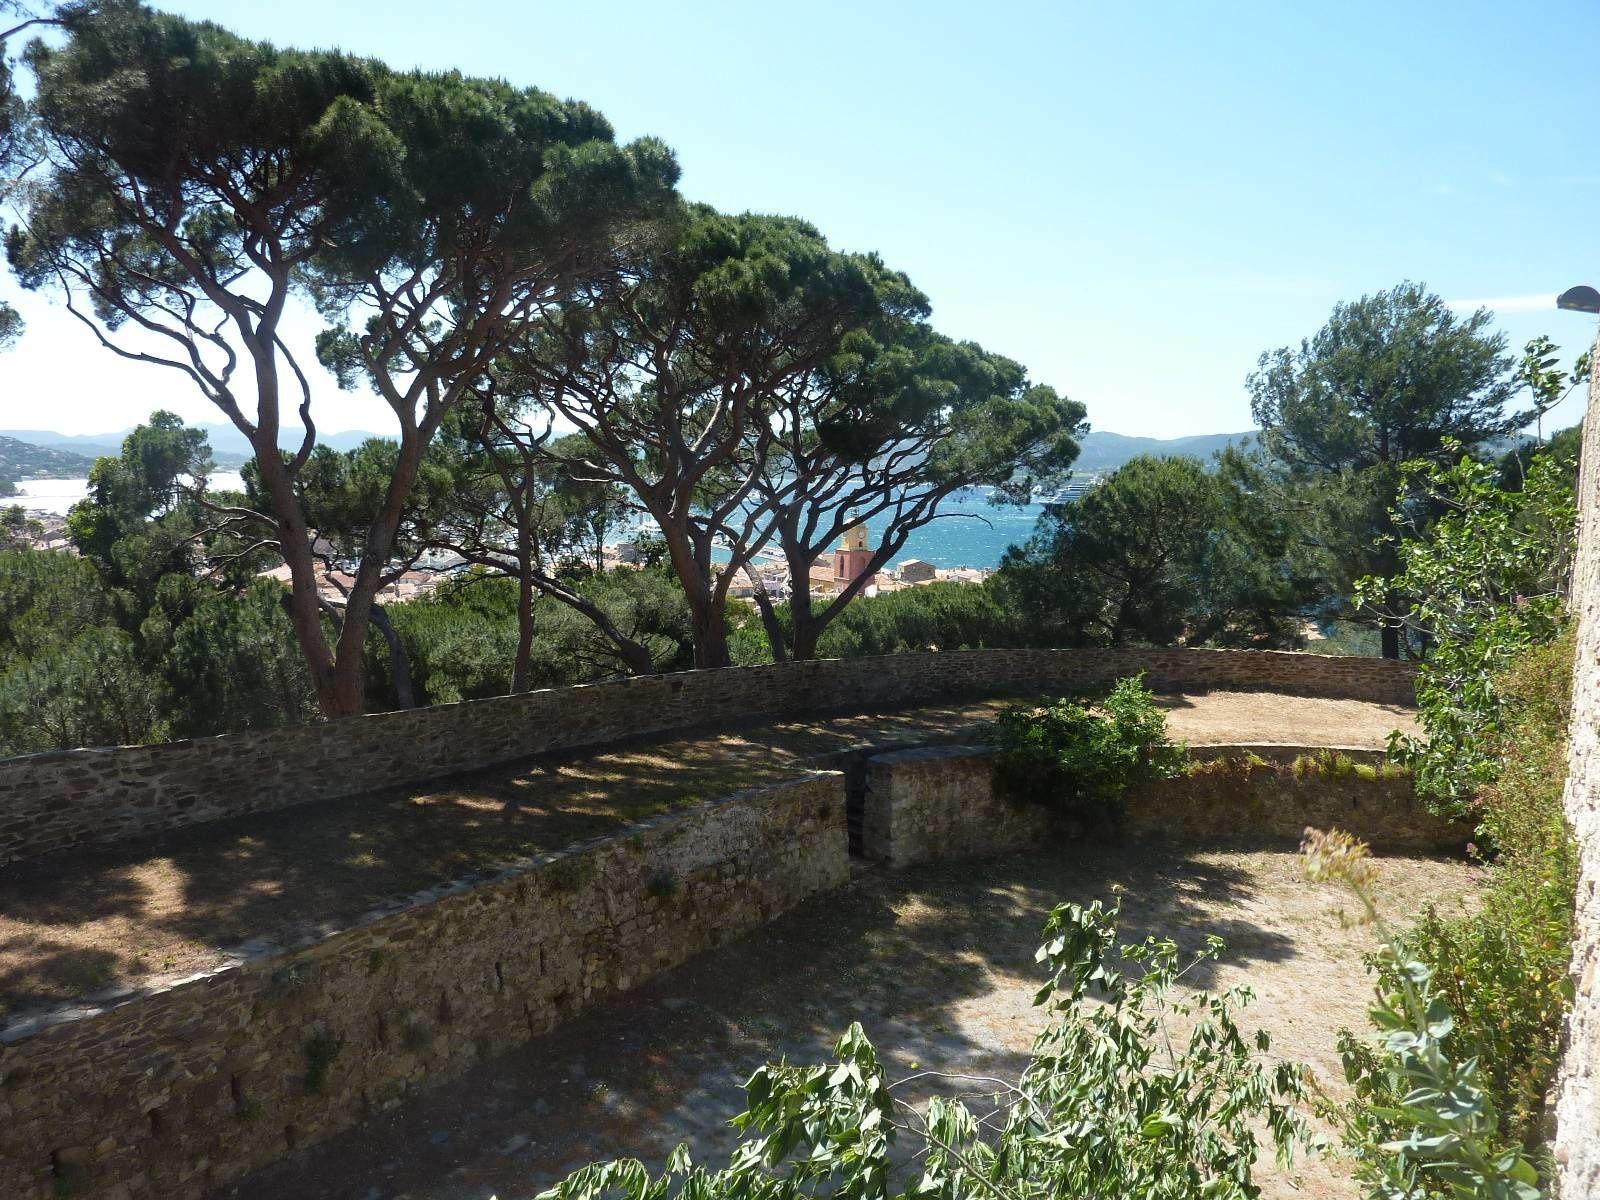 Méditerranée 2015 : balade à Saint-Tropez